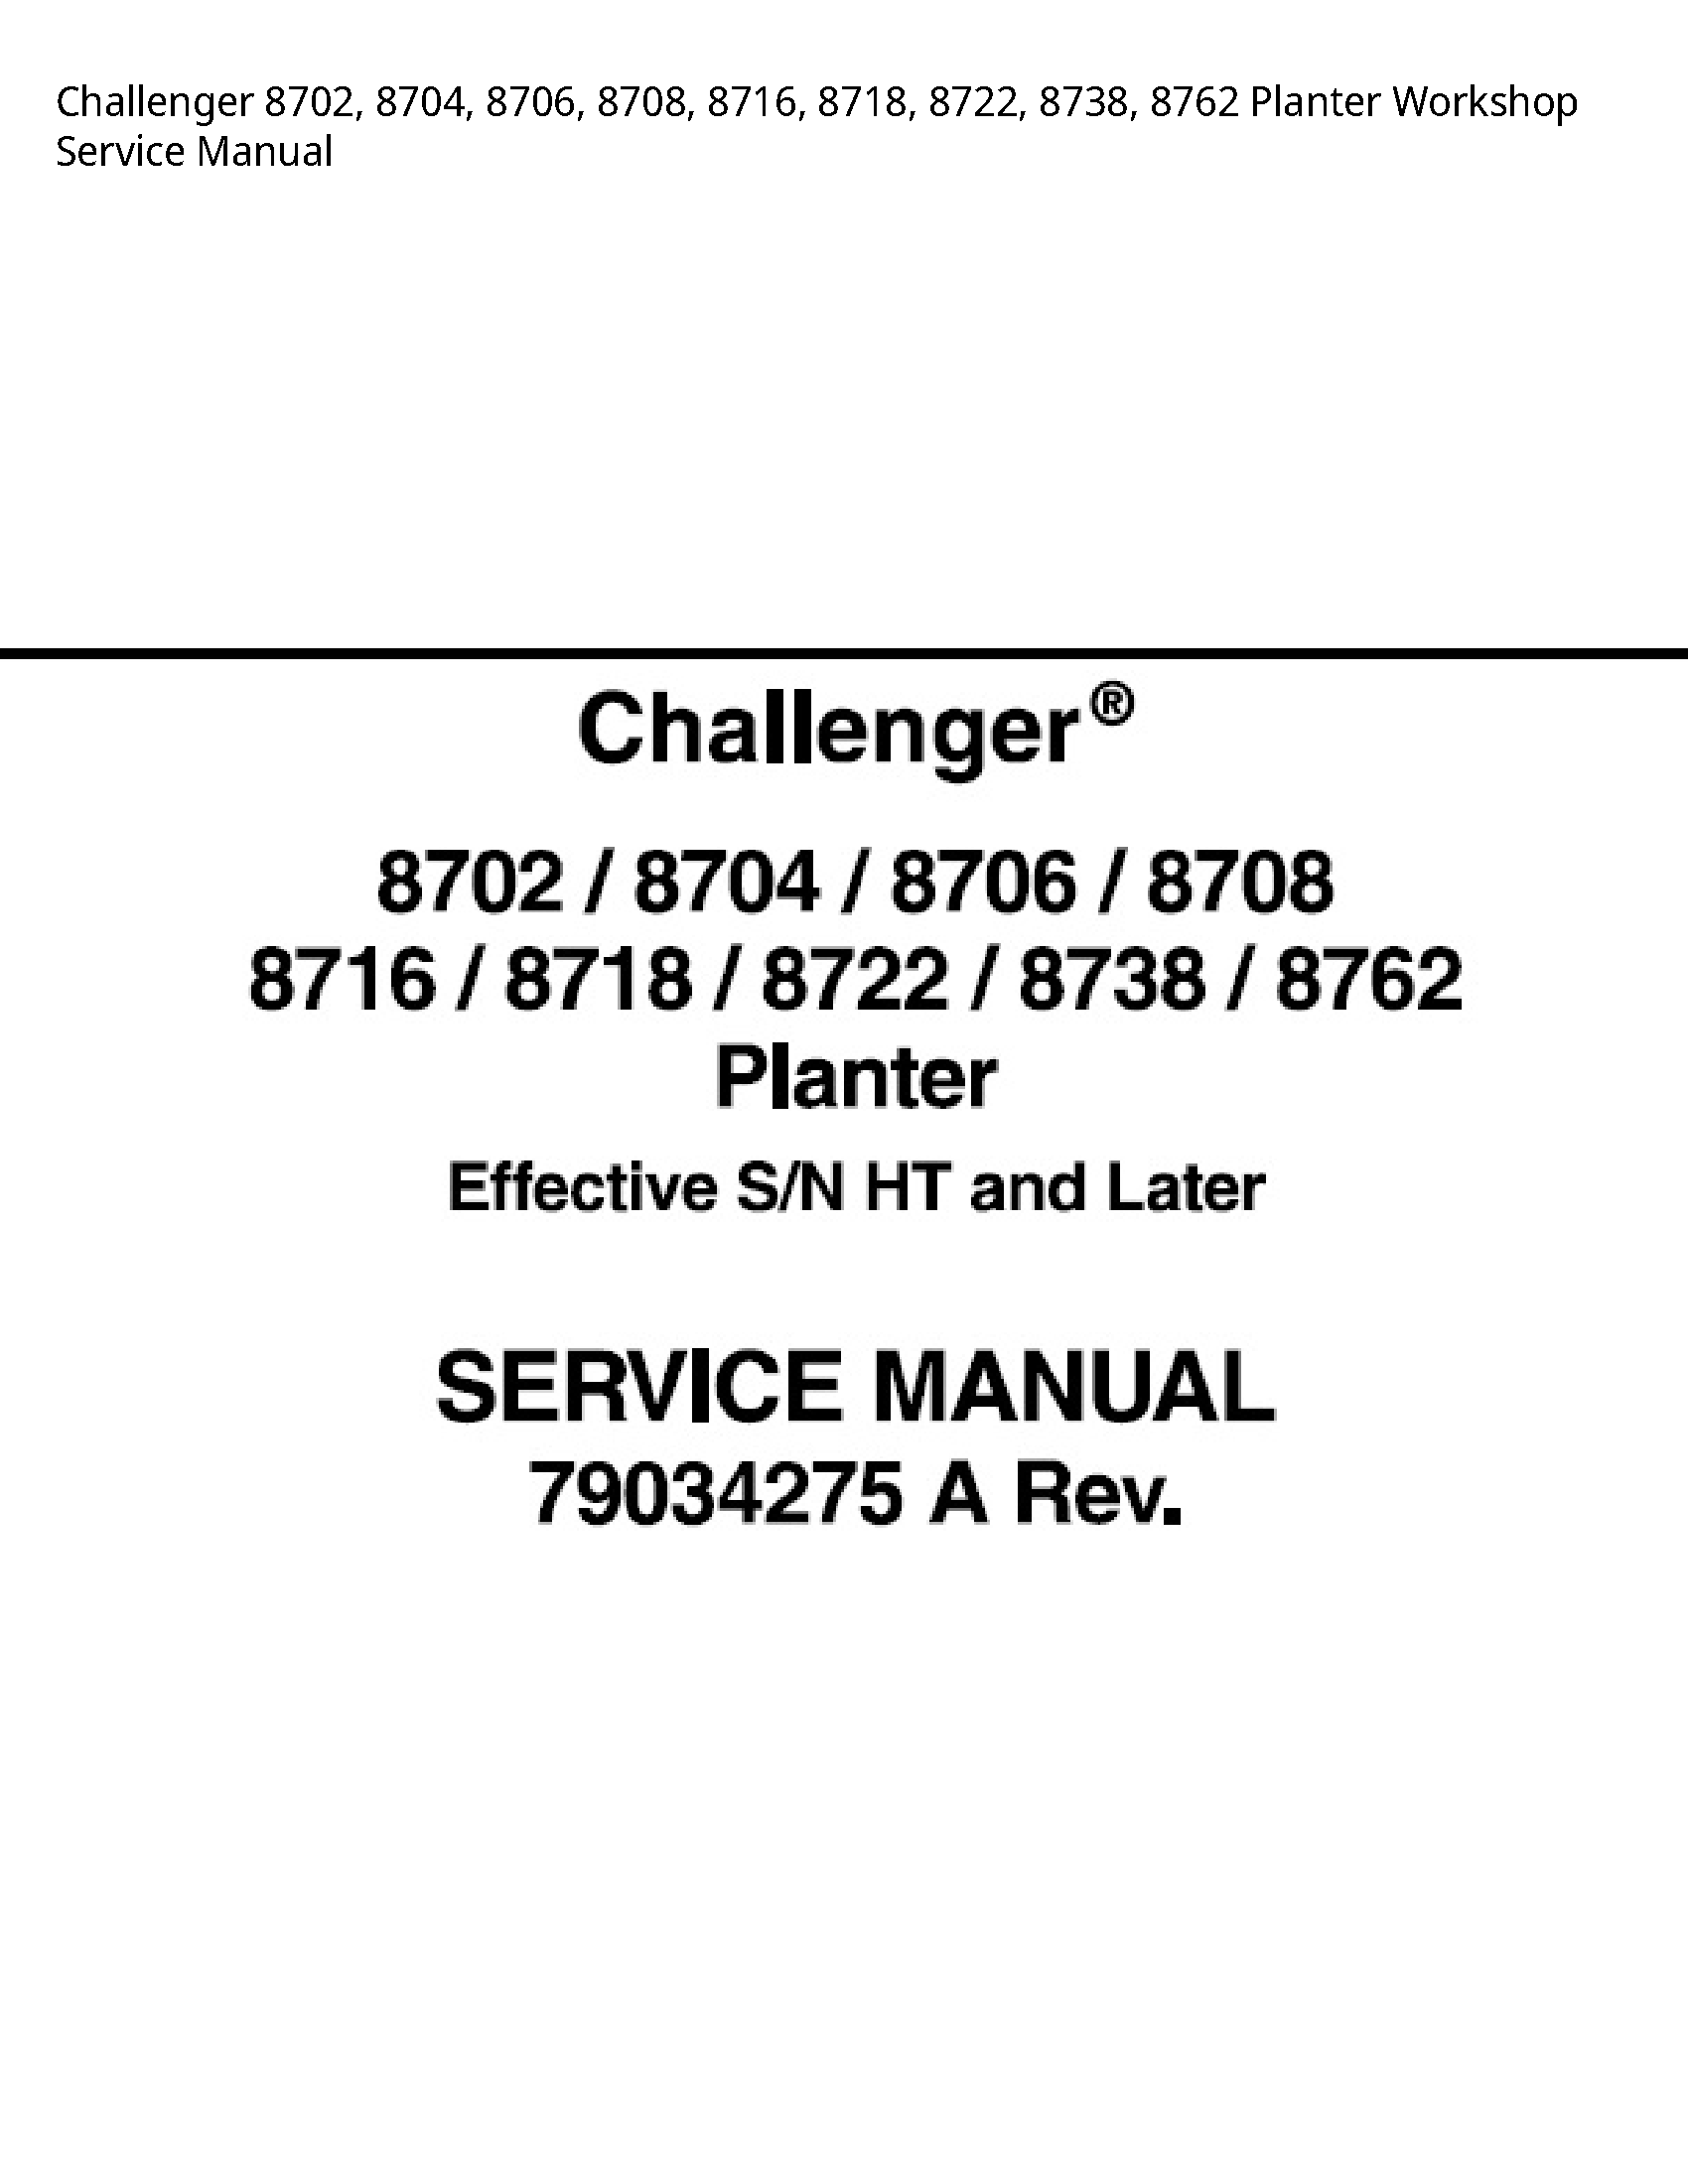 Challenger 8702 Planter Service manual